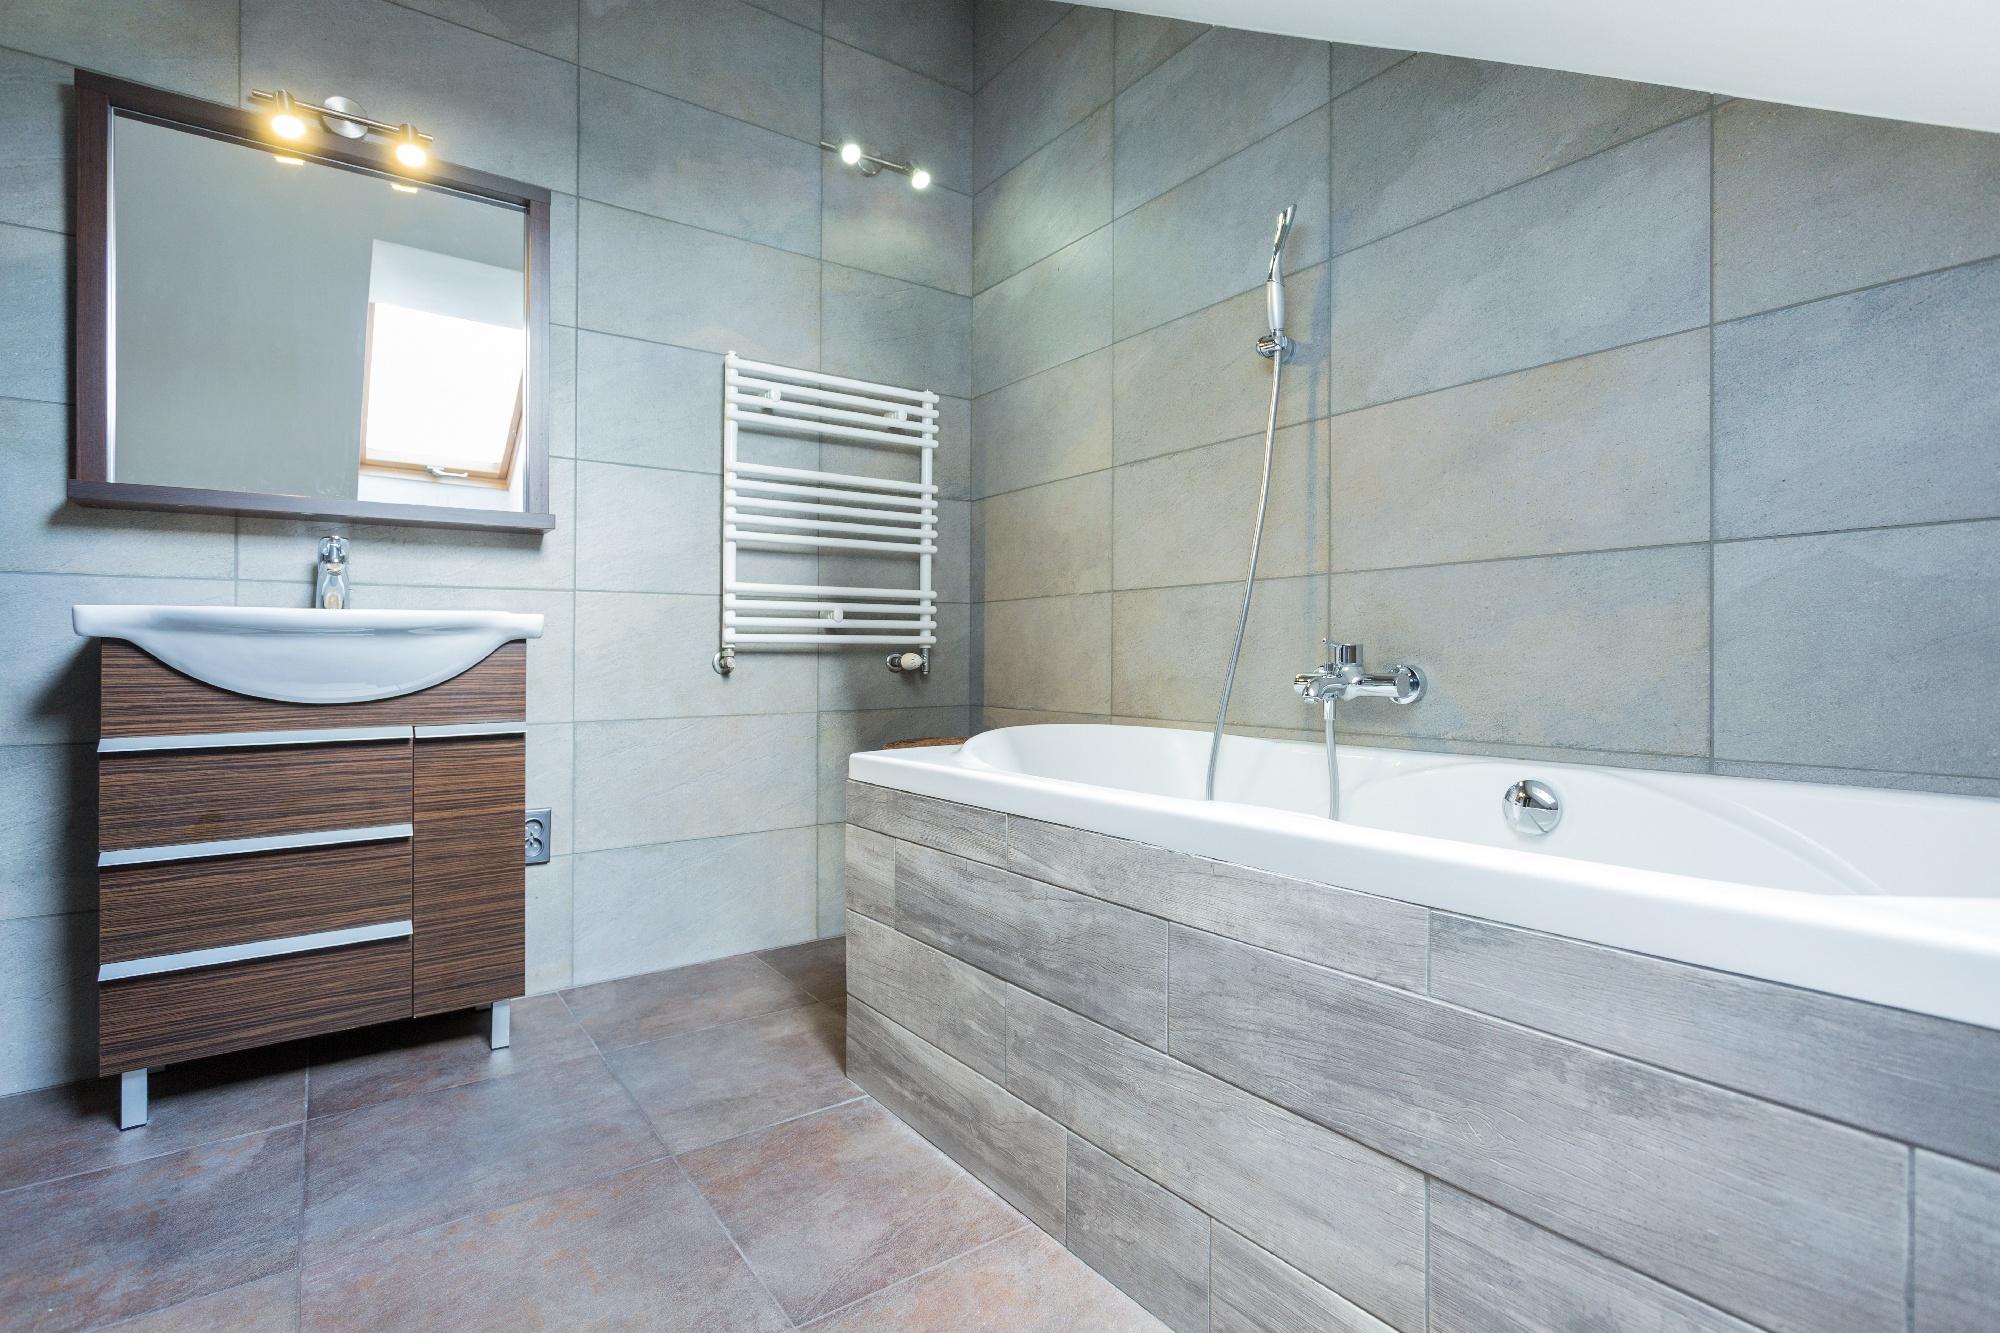 bathroom tile trend - matte finish